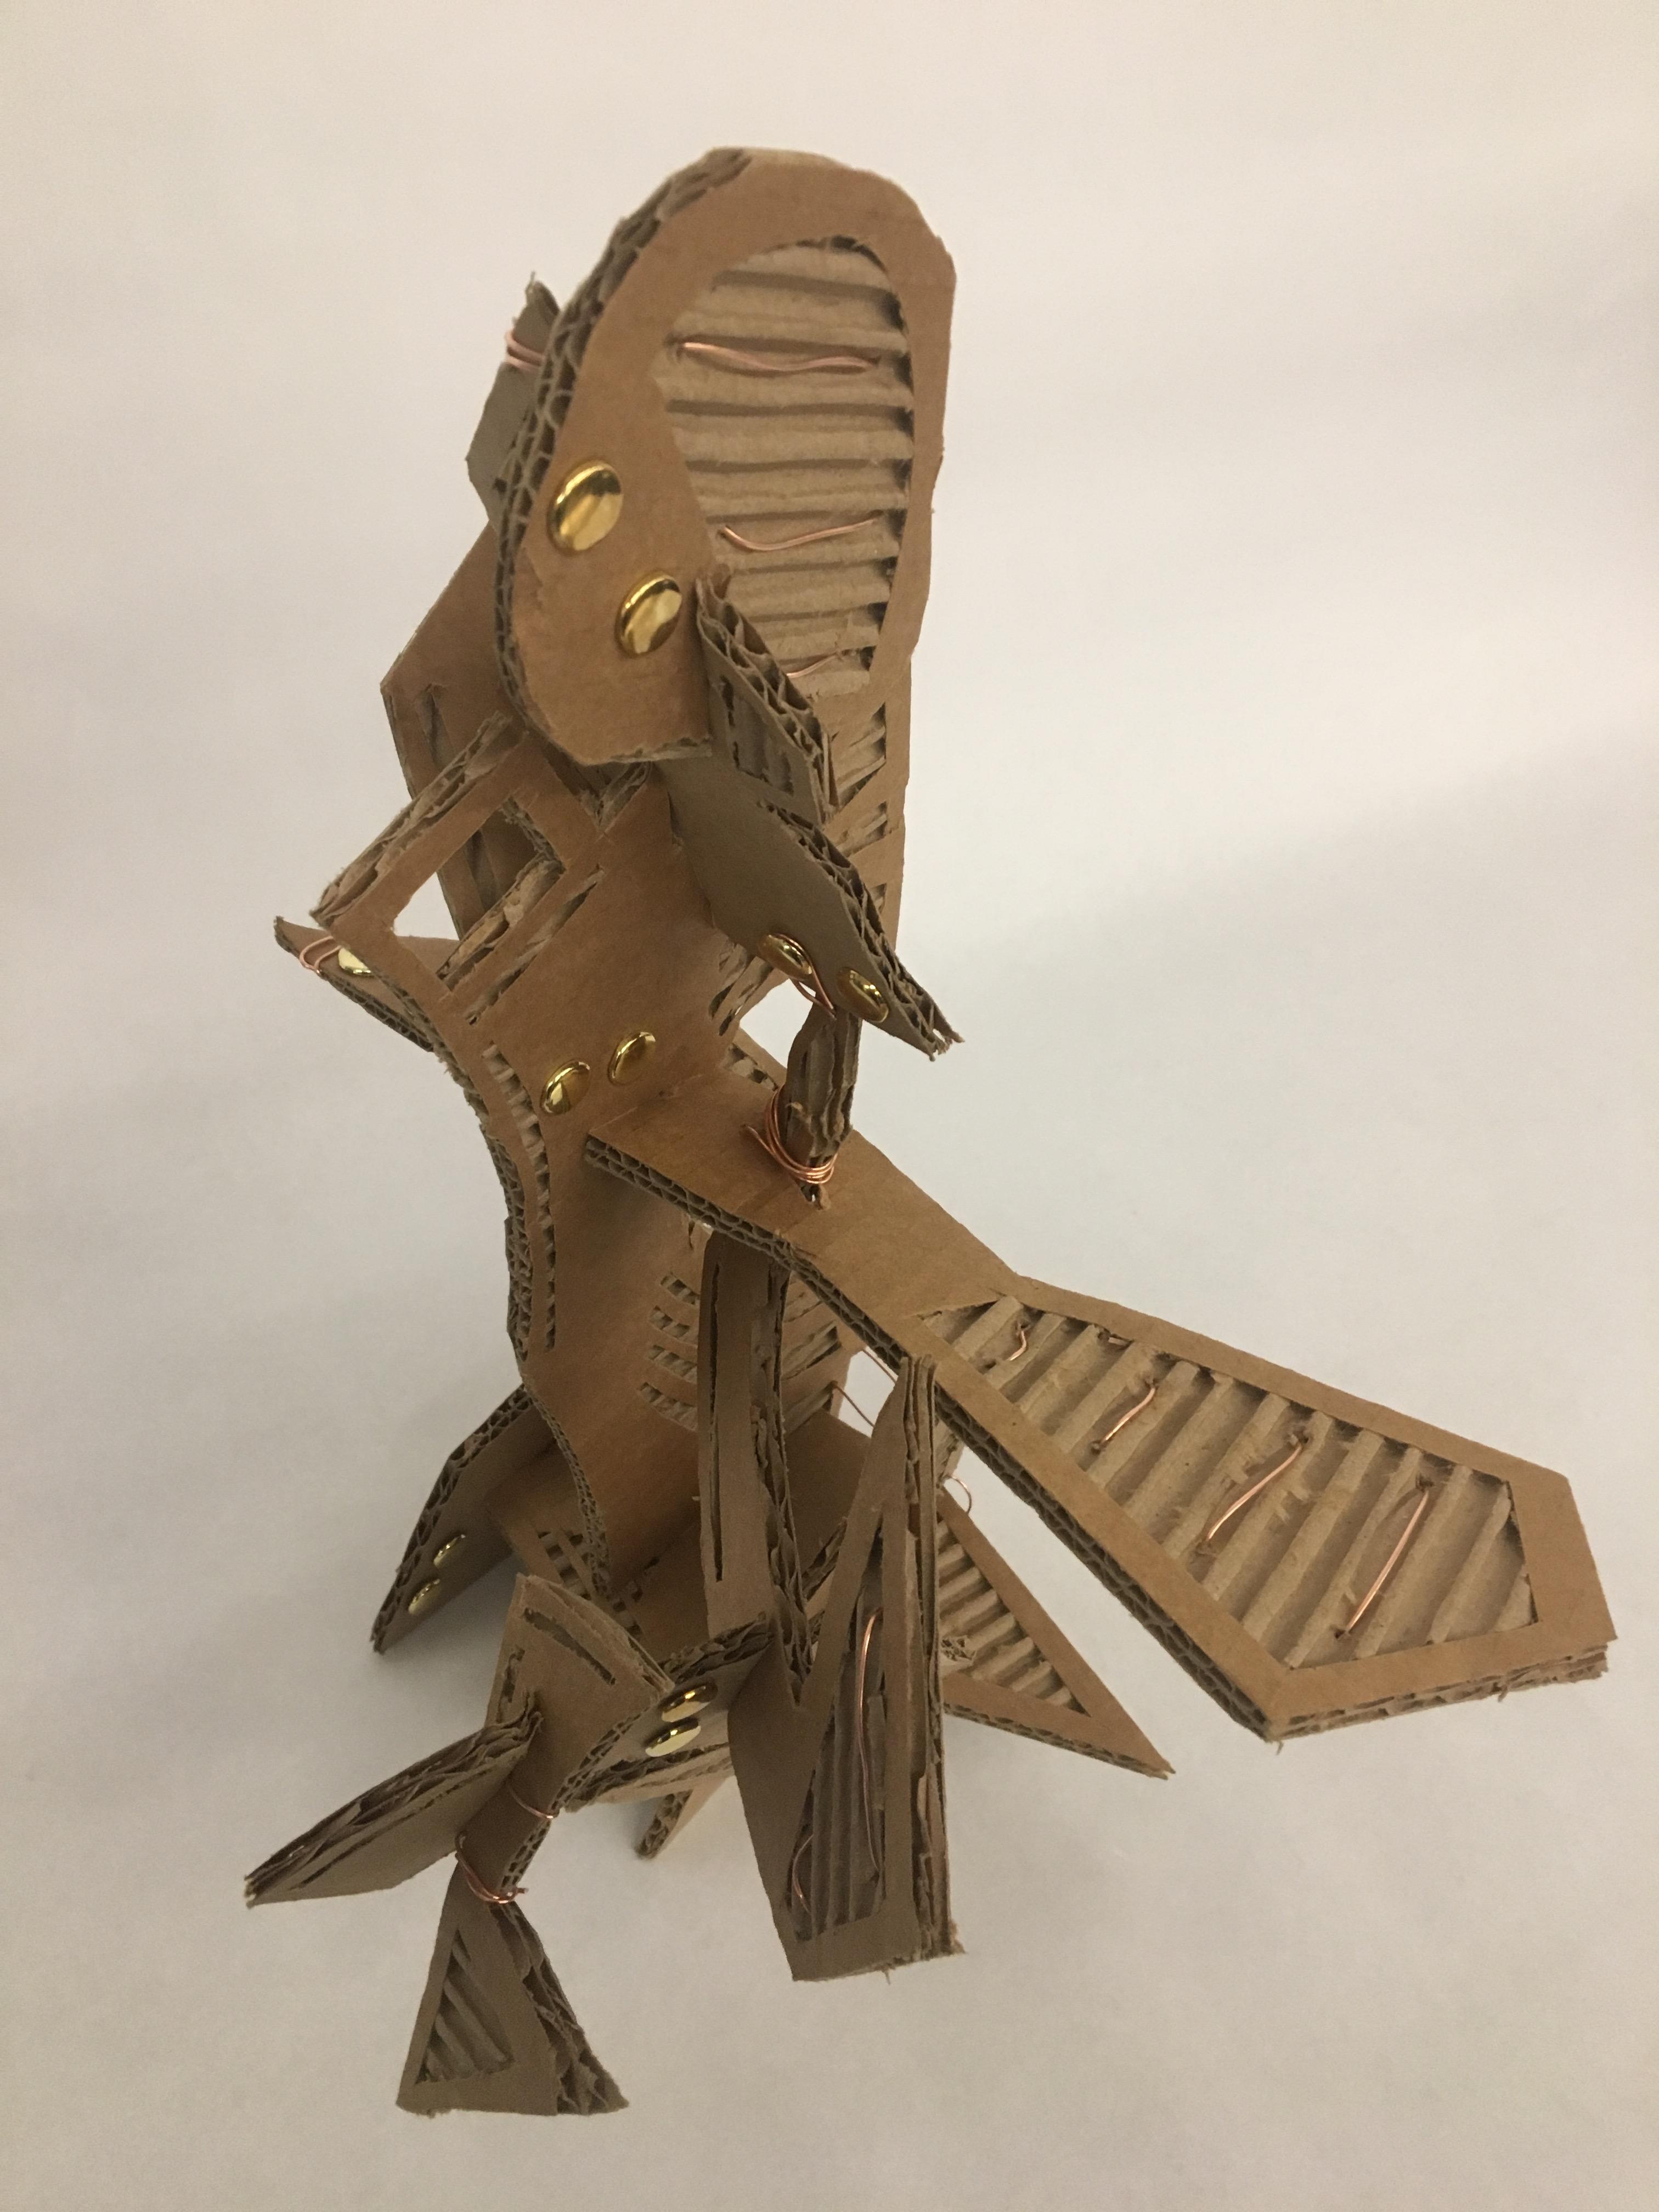 Cardboard Haptic/Textural Studies Sculpture